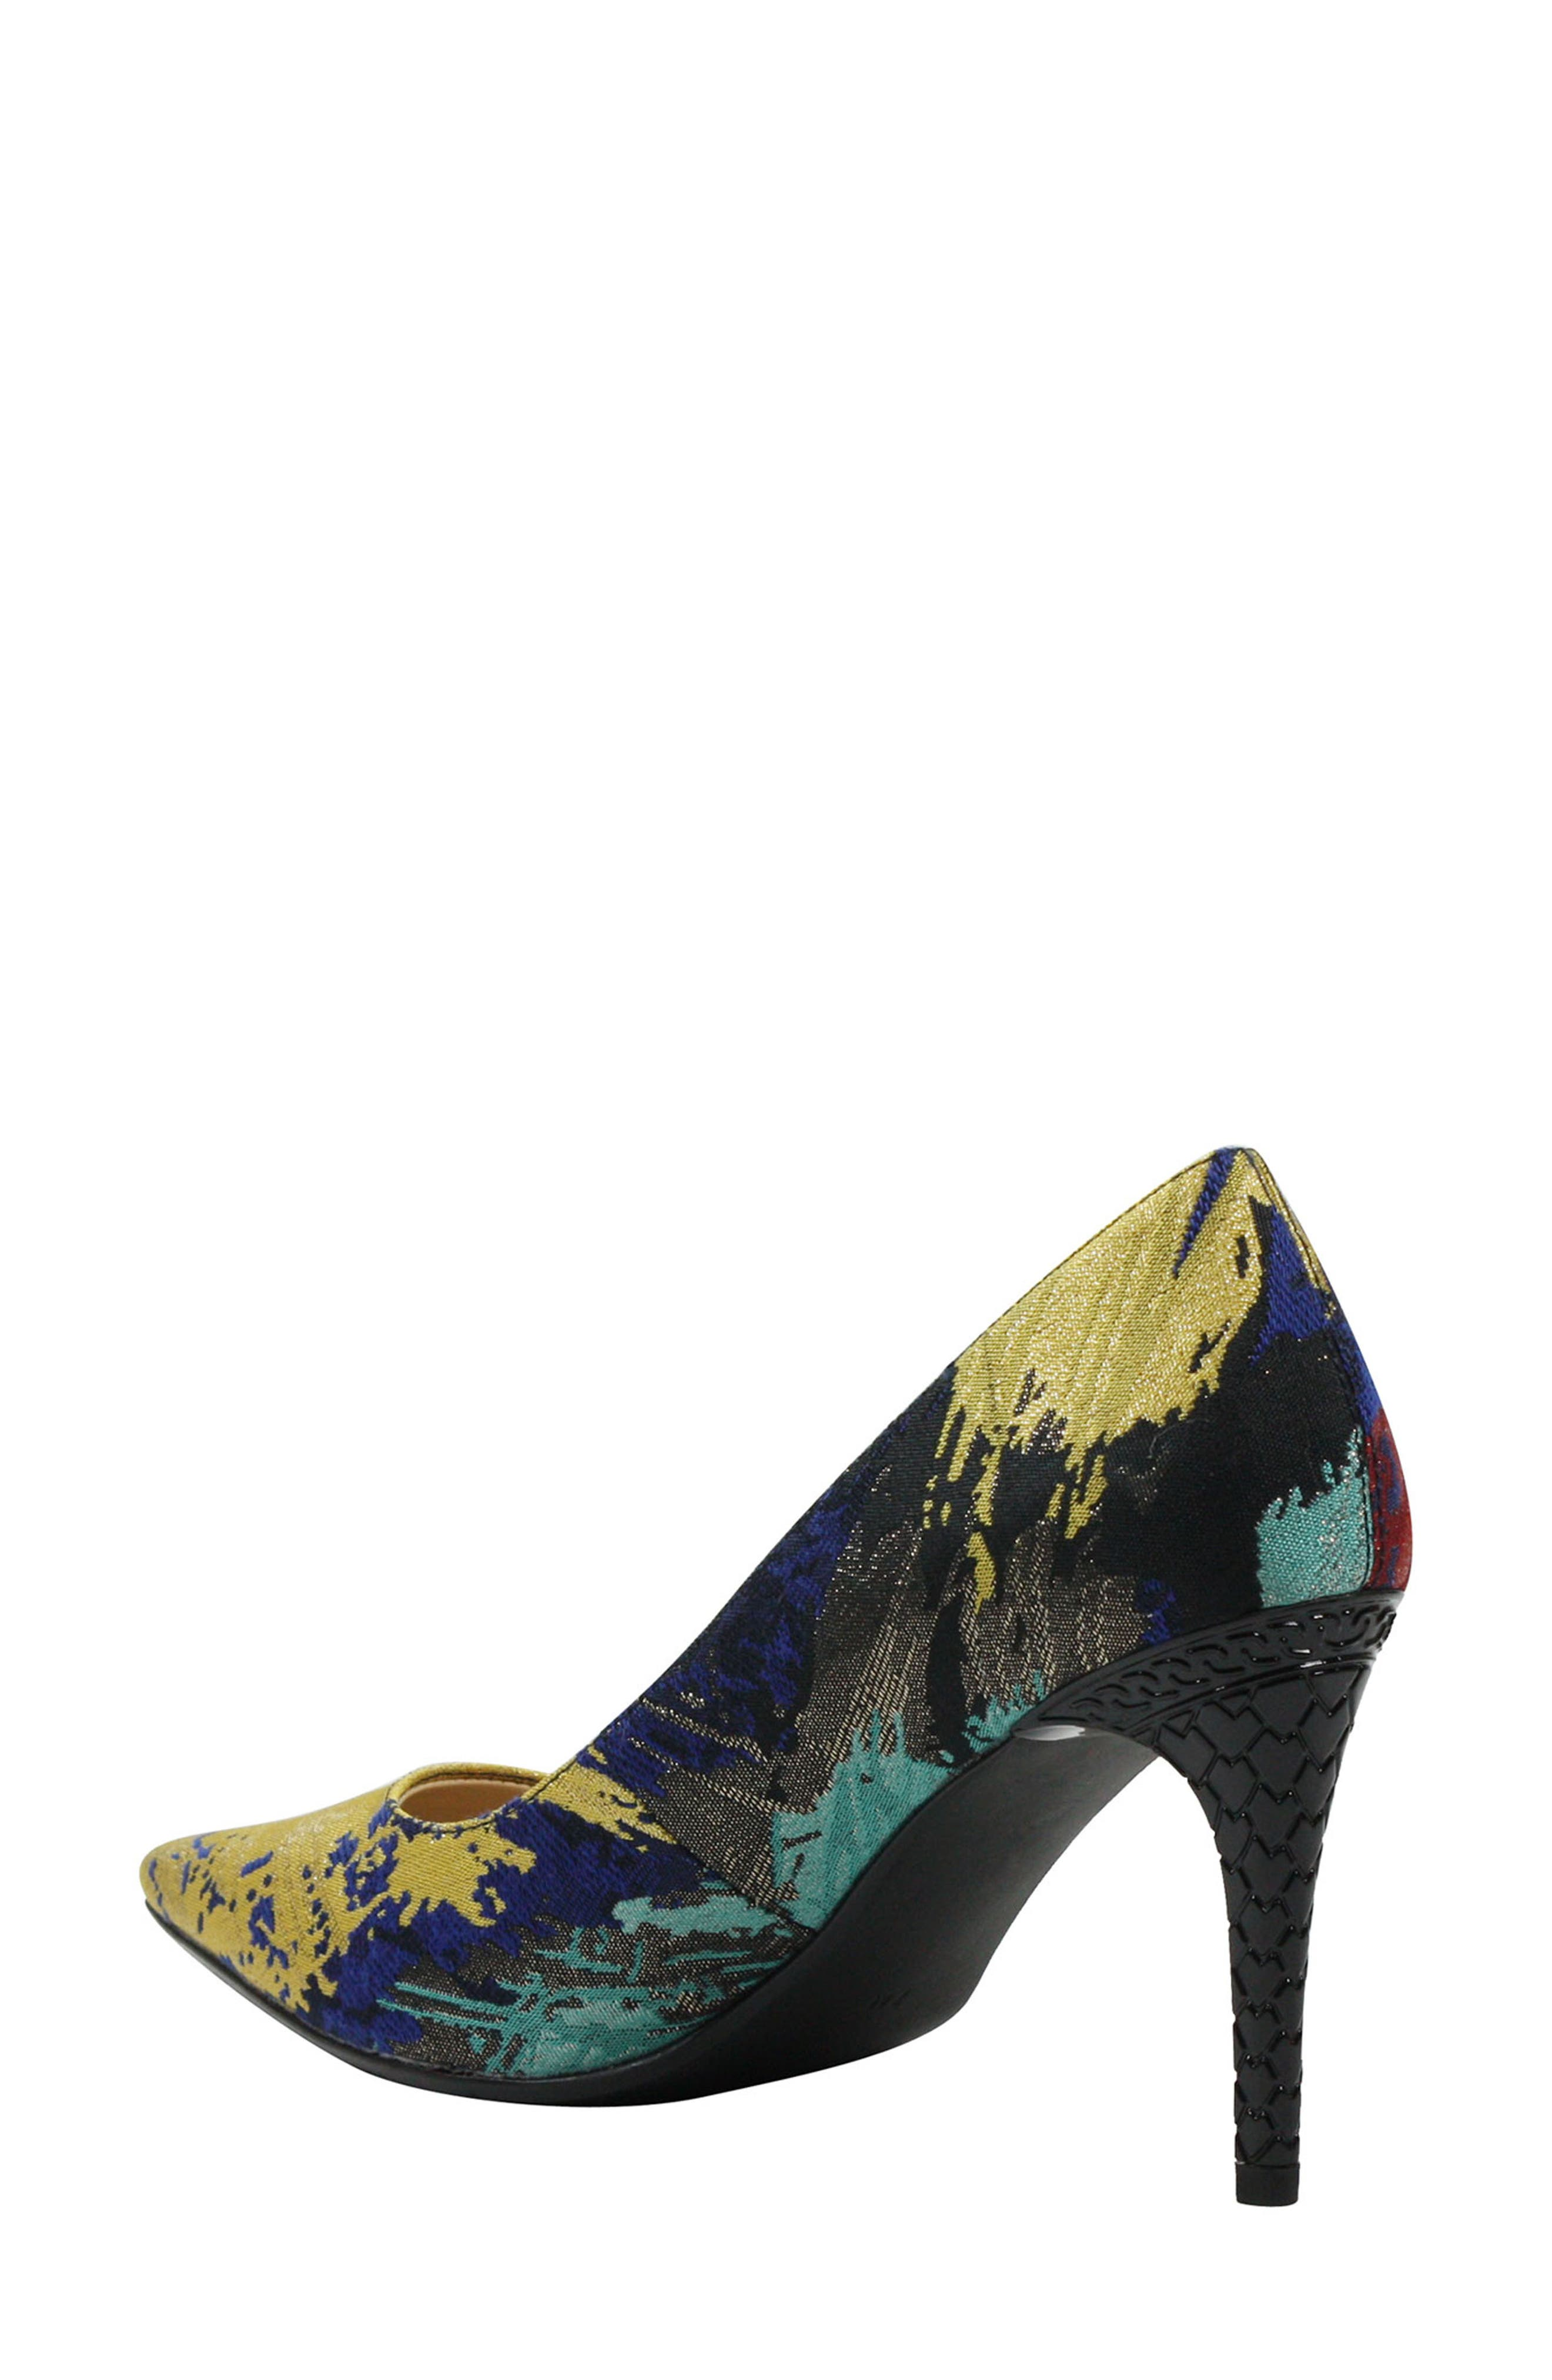 J. RENEÉ, 'Maressa' Pointy Toe Pump, Alternate thumbnail 2, color, BLUE/ BLACK MULTI